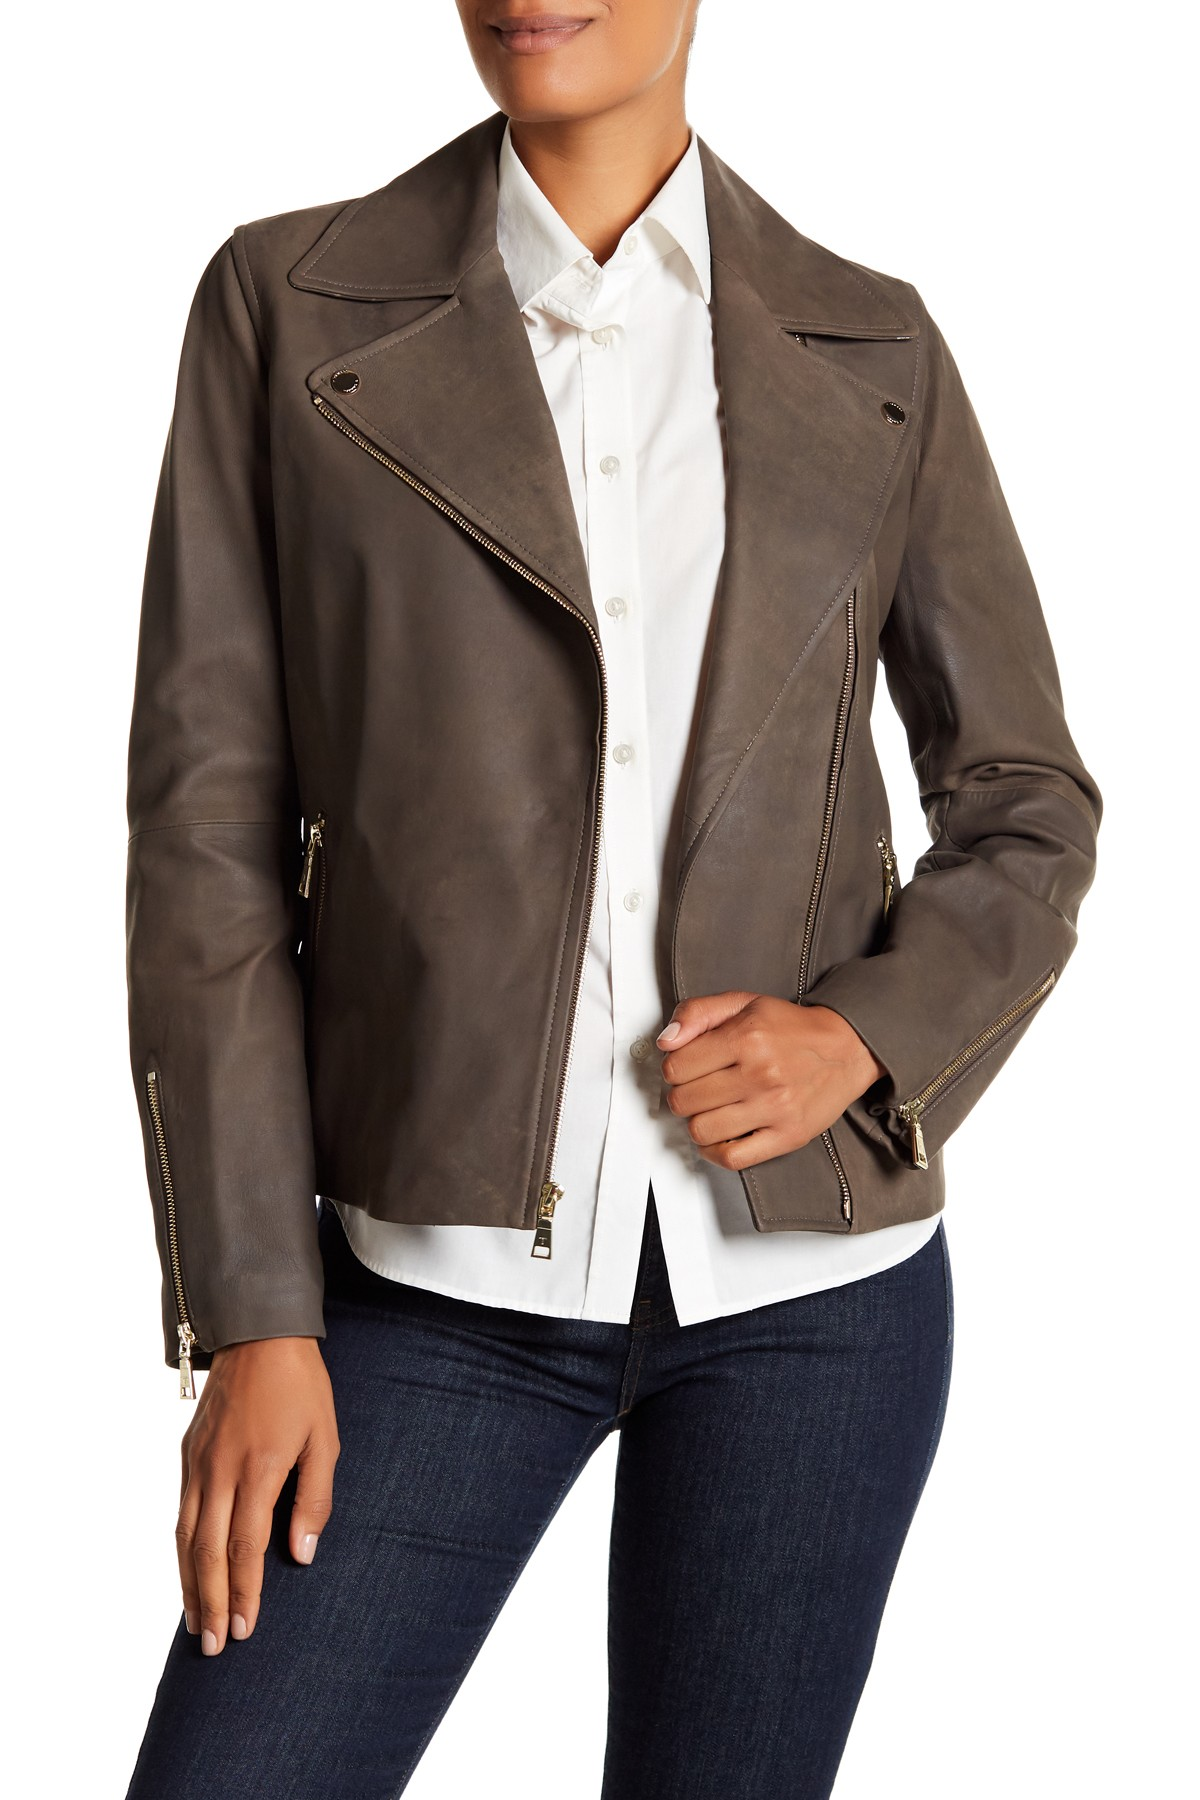 230 Skylar Leather Jacket By T Tahari On Nordstrom Rack Leather Jacket Jackets Mens Jackets [ 1800 x 1200 Pixel ]